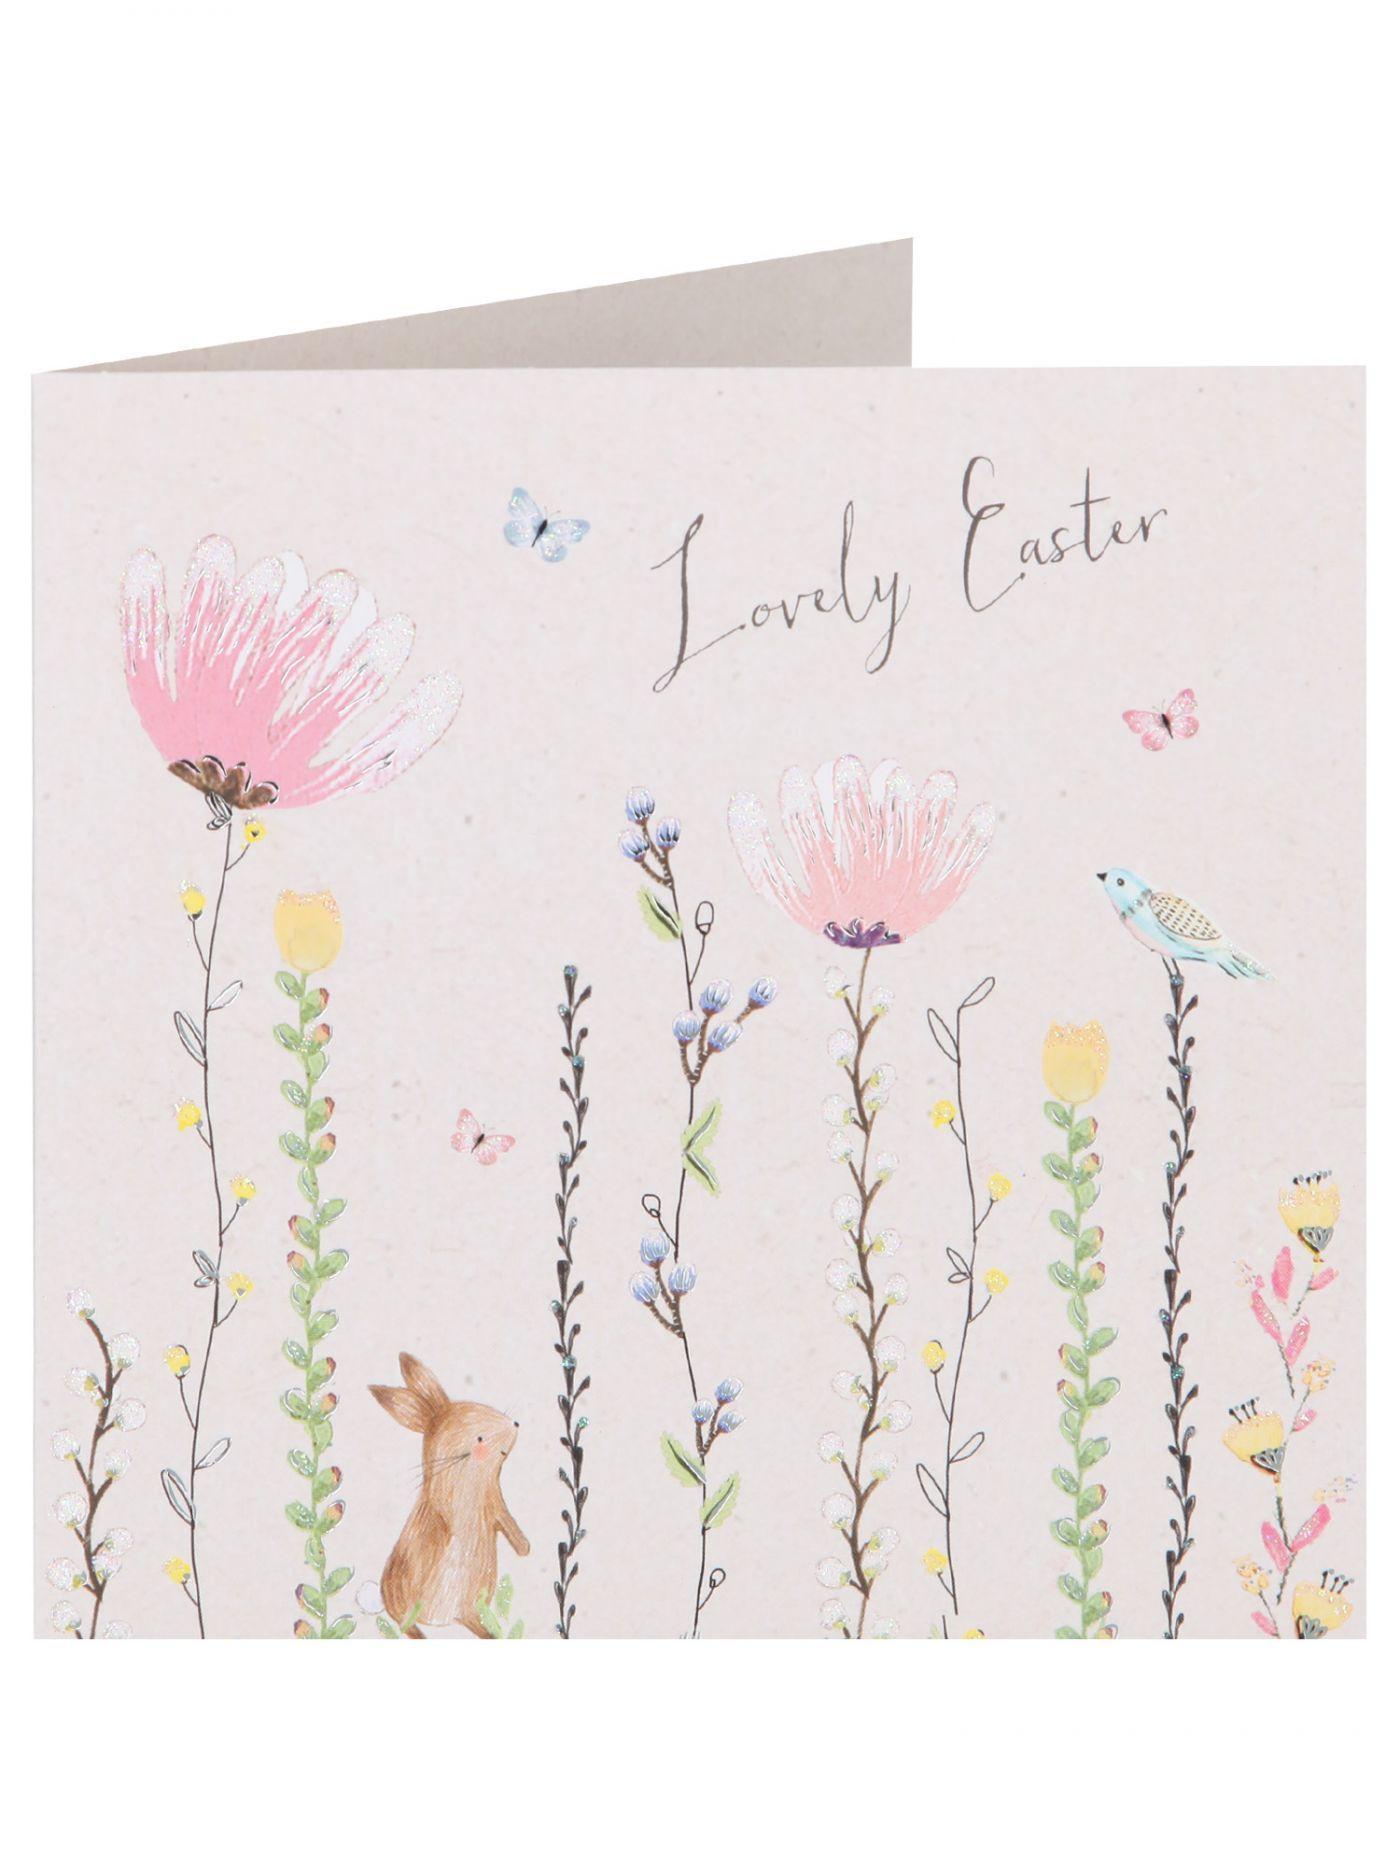 A La Mode Lovely Easter Card